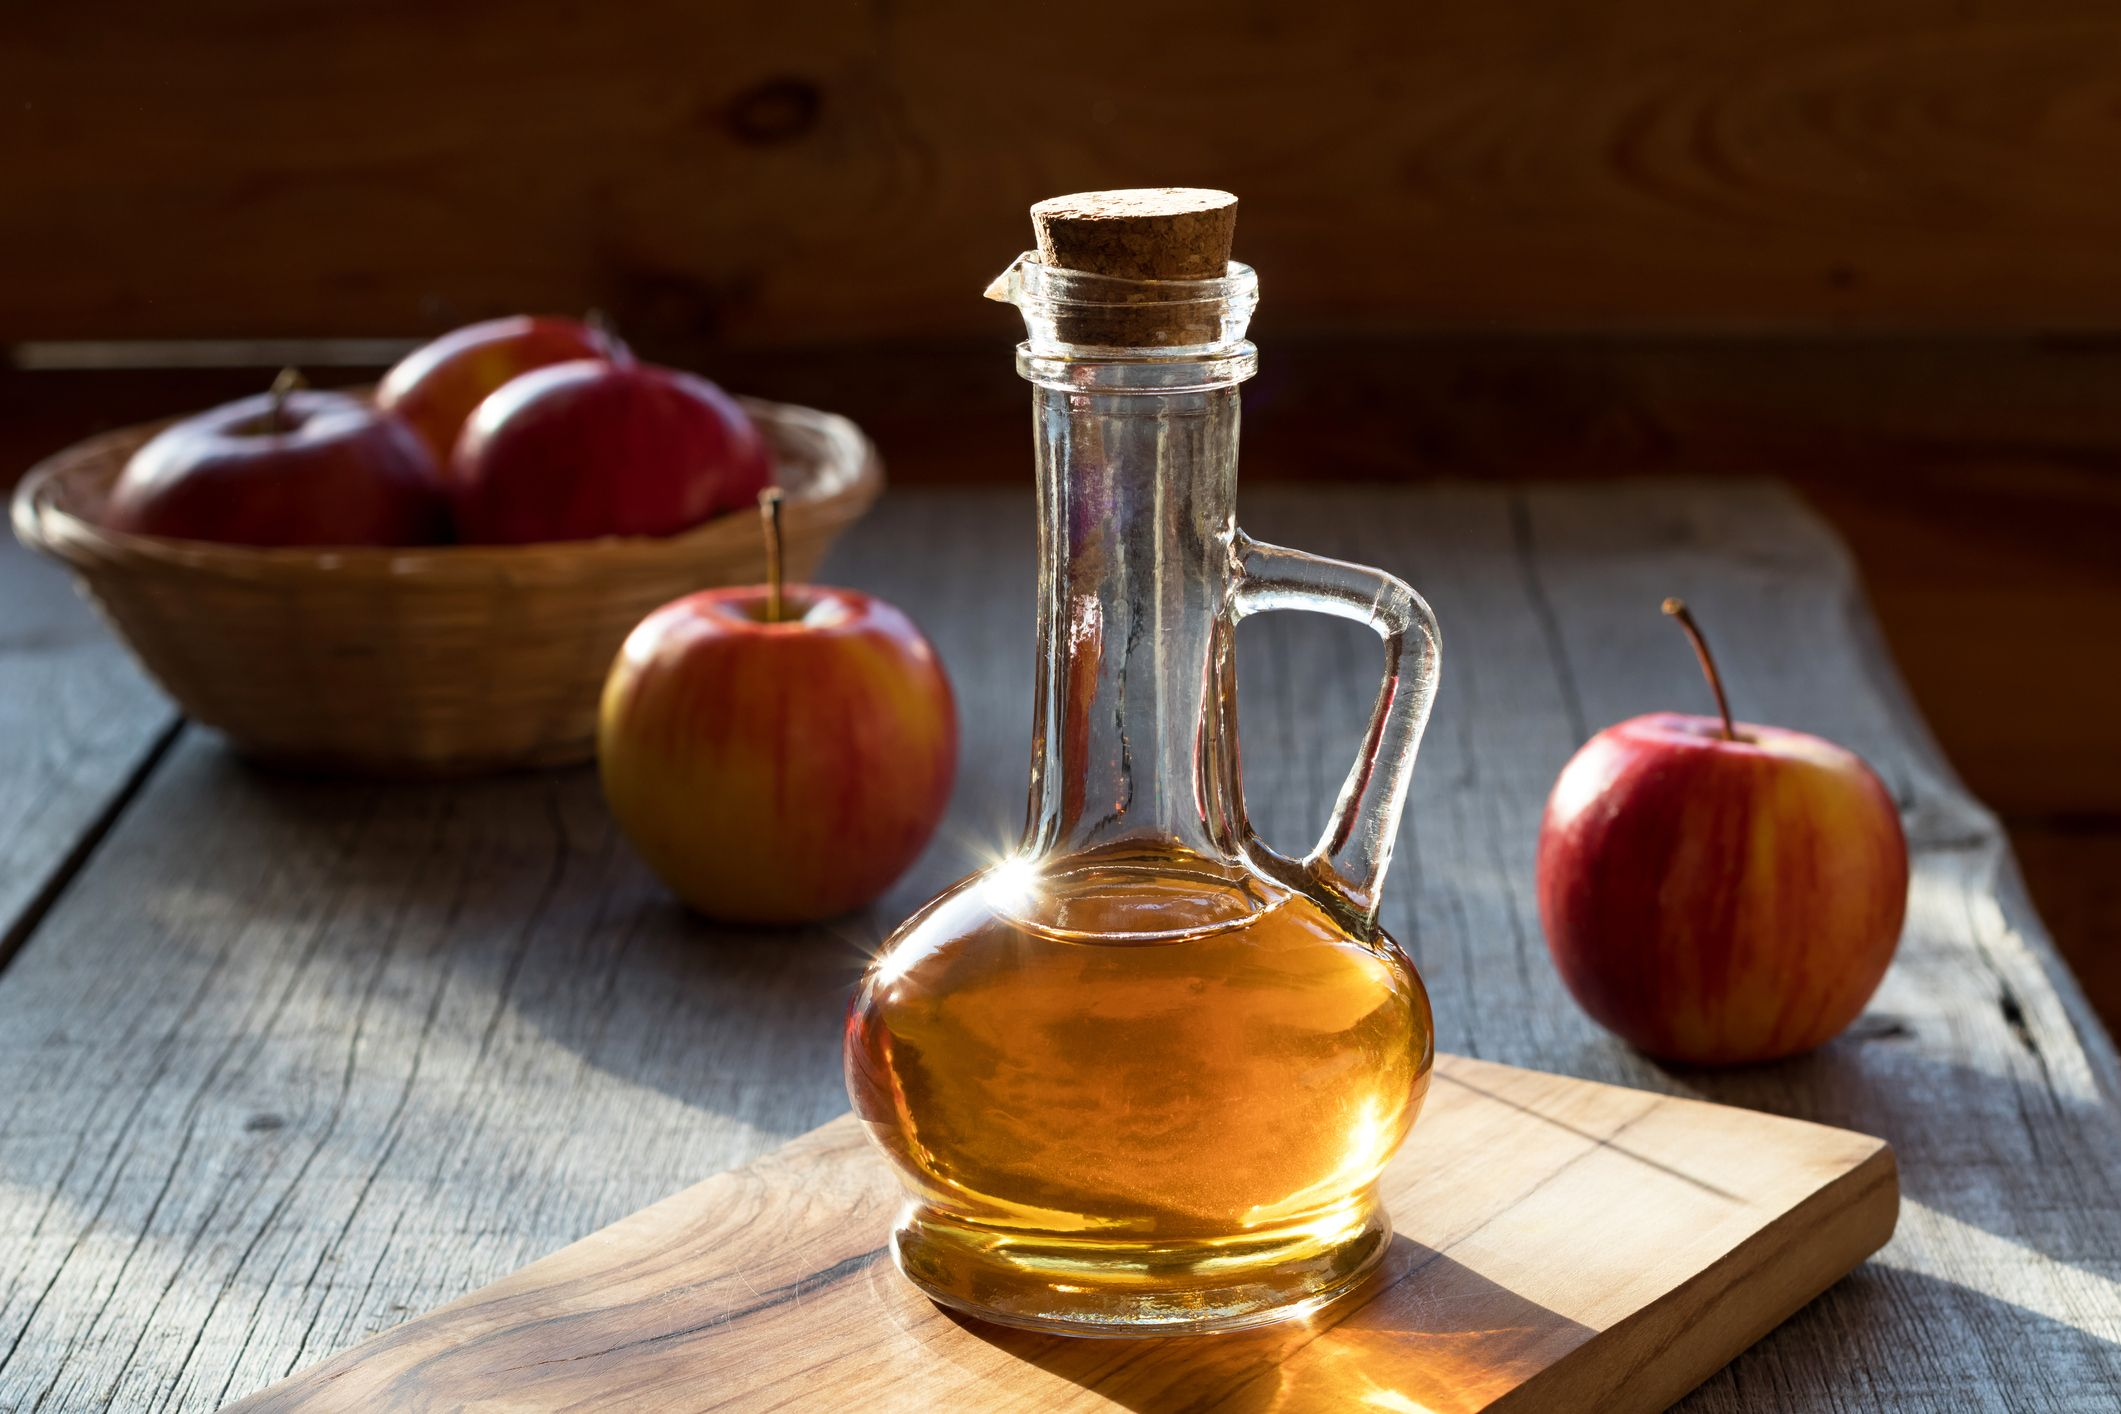 Apple Cider Vinegar A List of